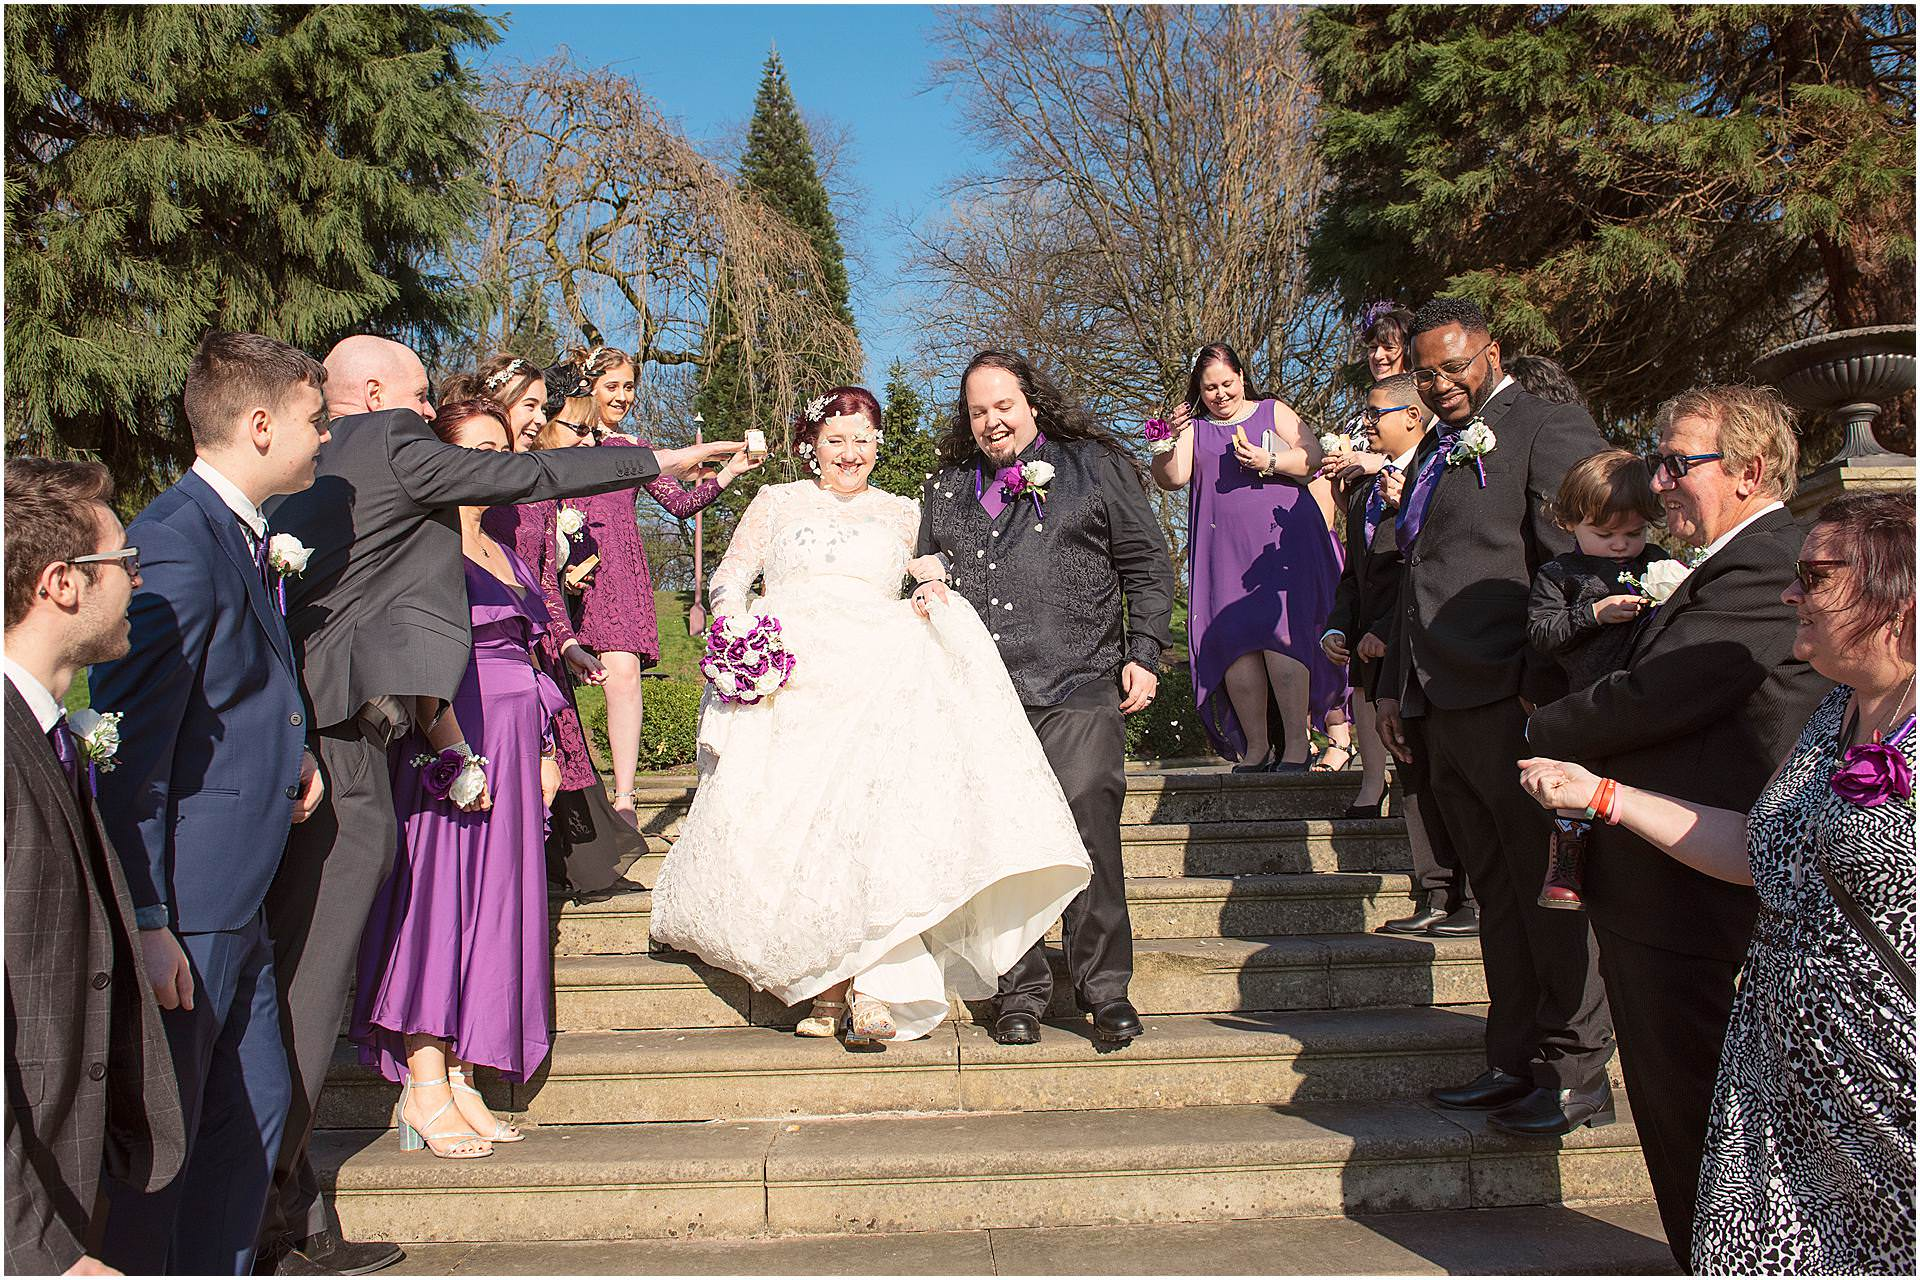 wedding_photography at dukinfield_townhall with sarah_bee_photography dukinfield_park dukinfeild_cheshire_2009.jpg